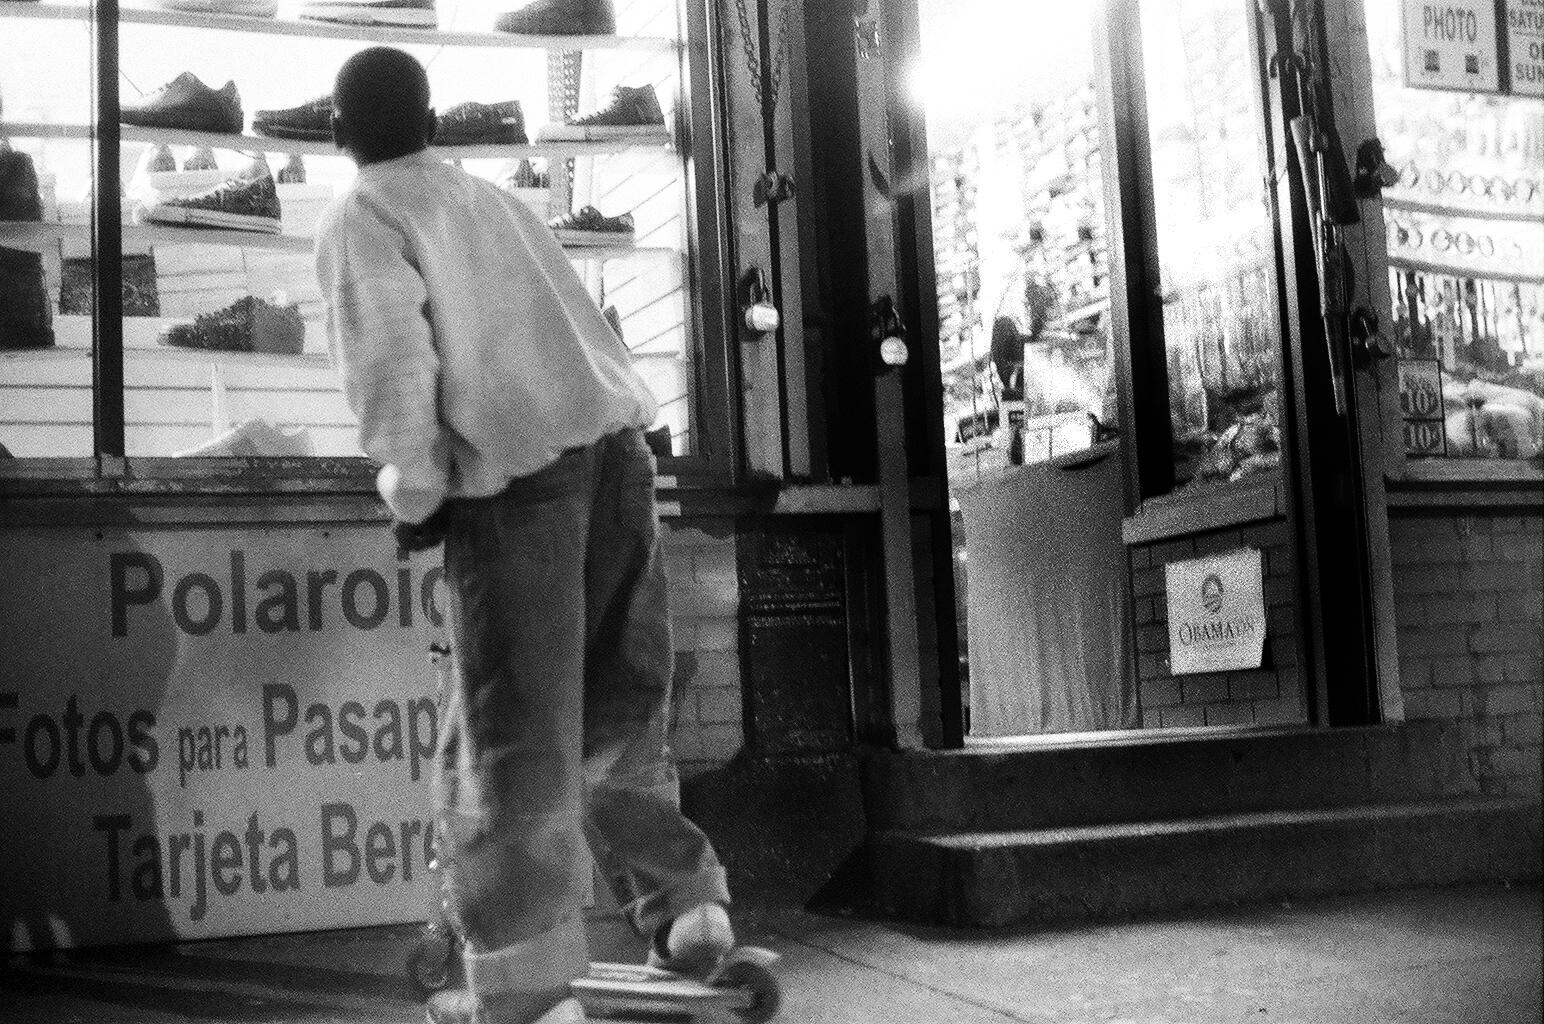 On the Street, New York City (2008)© Sarah Windels